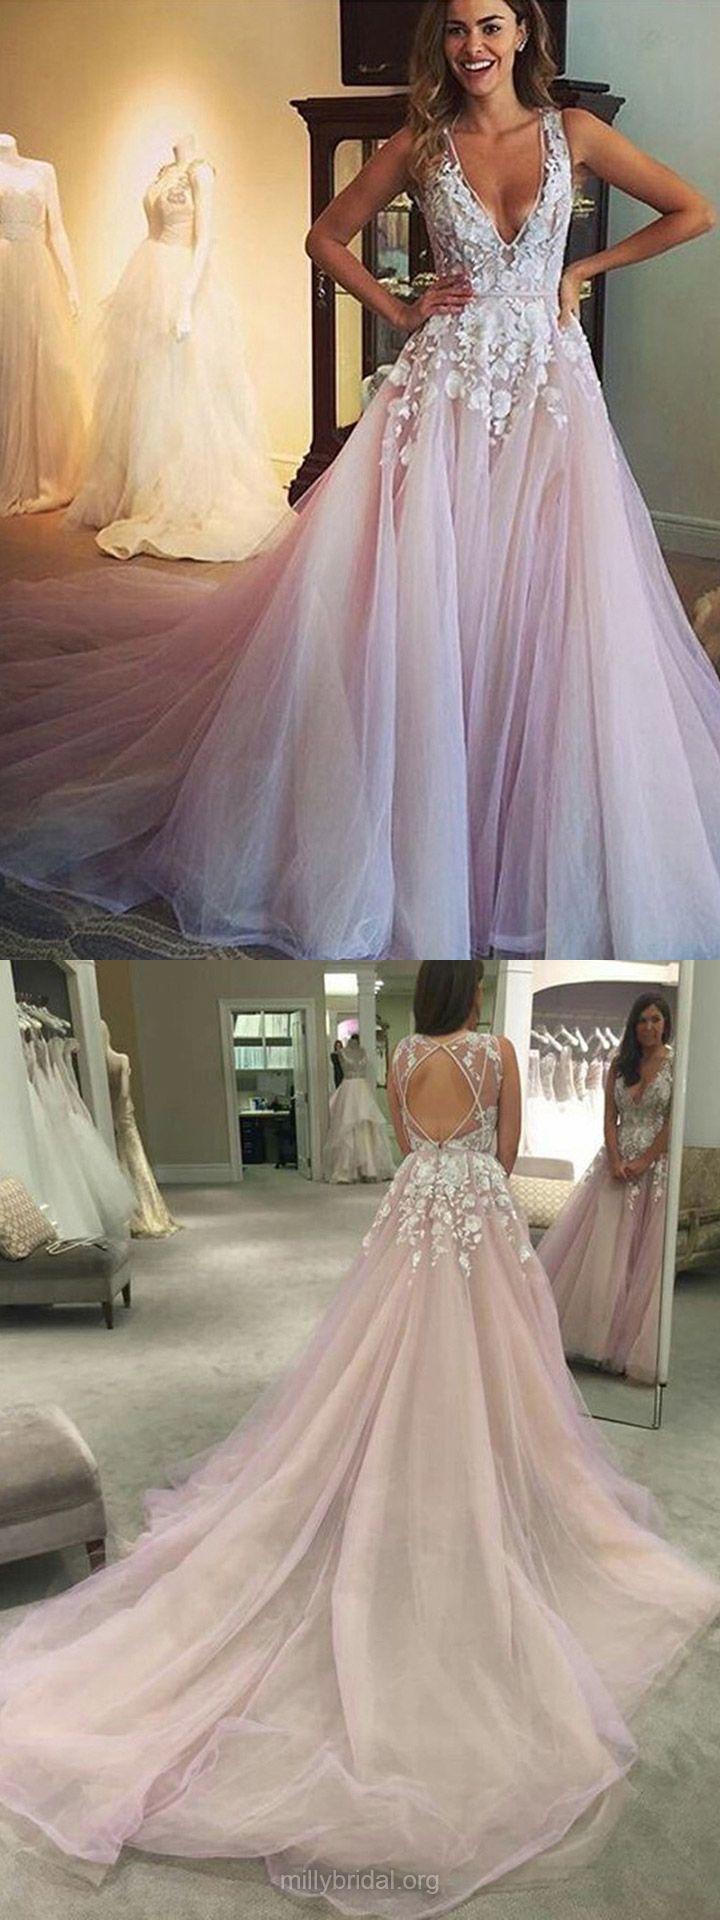 Amazing princess prom dressesvneck pink evening dressestulle